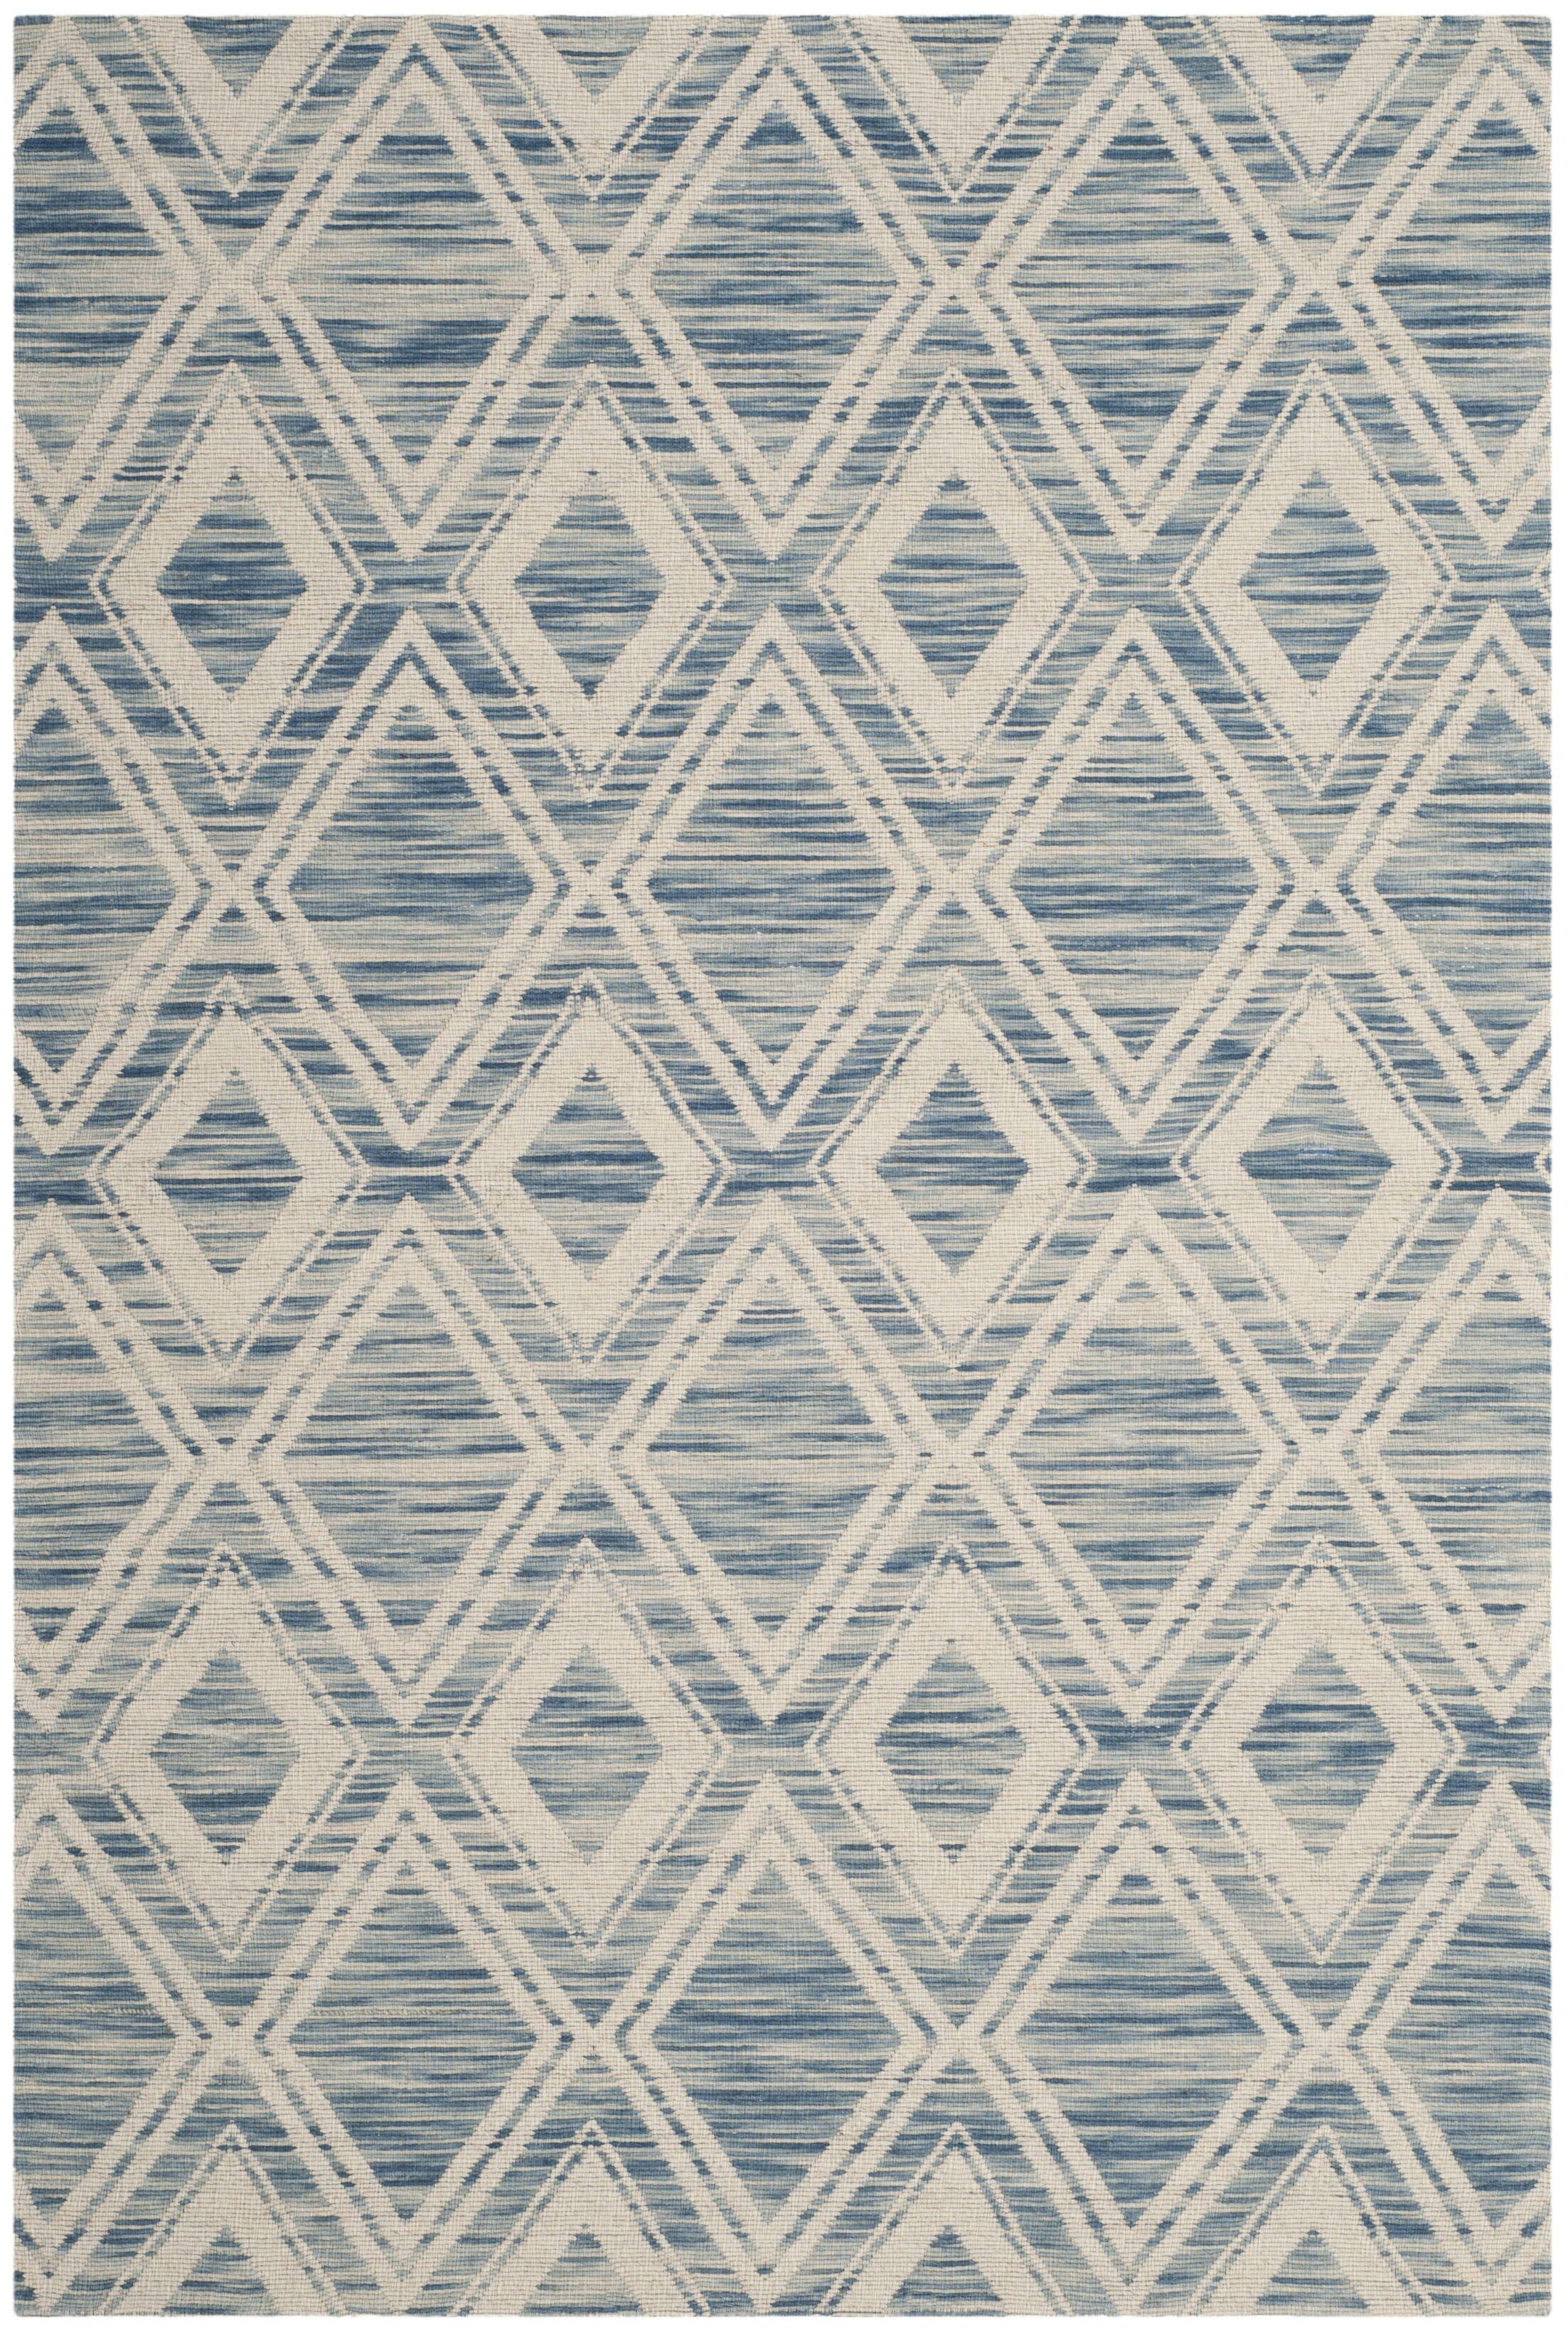 Alexandria Hand-Woven Dark blue/Ivory Area Rug Rug Size: Rectangle 4' x 6'